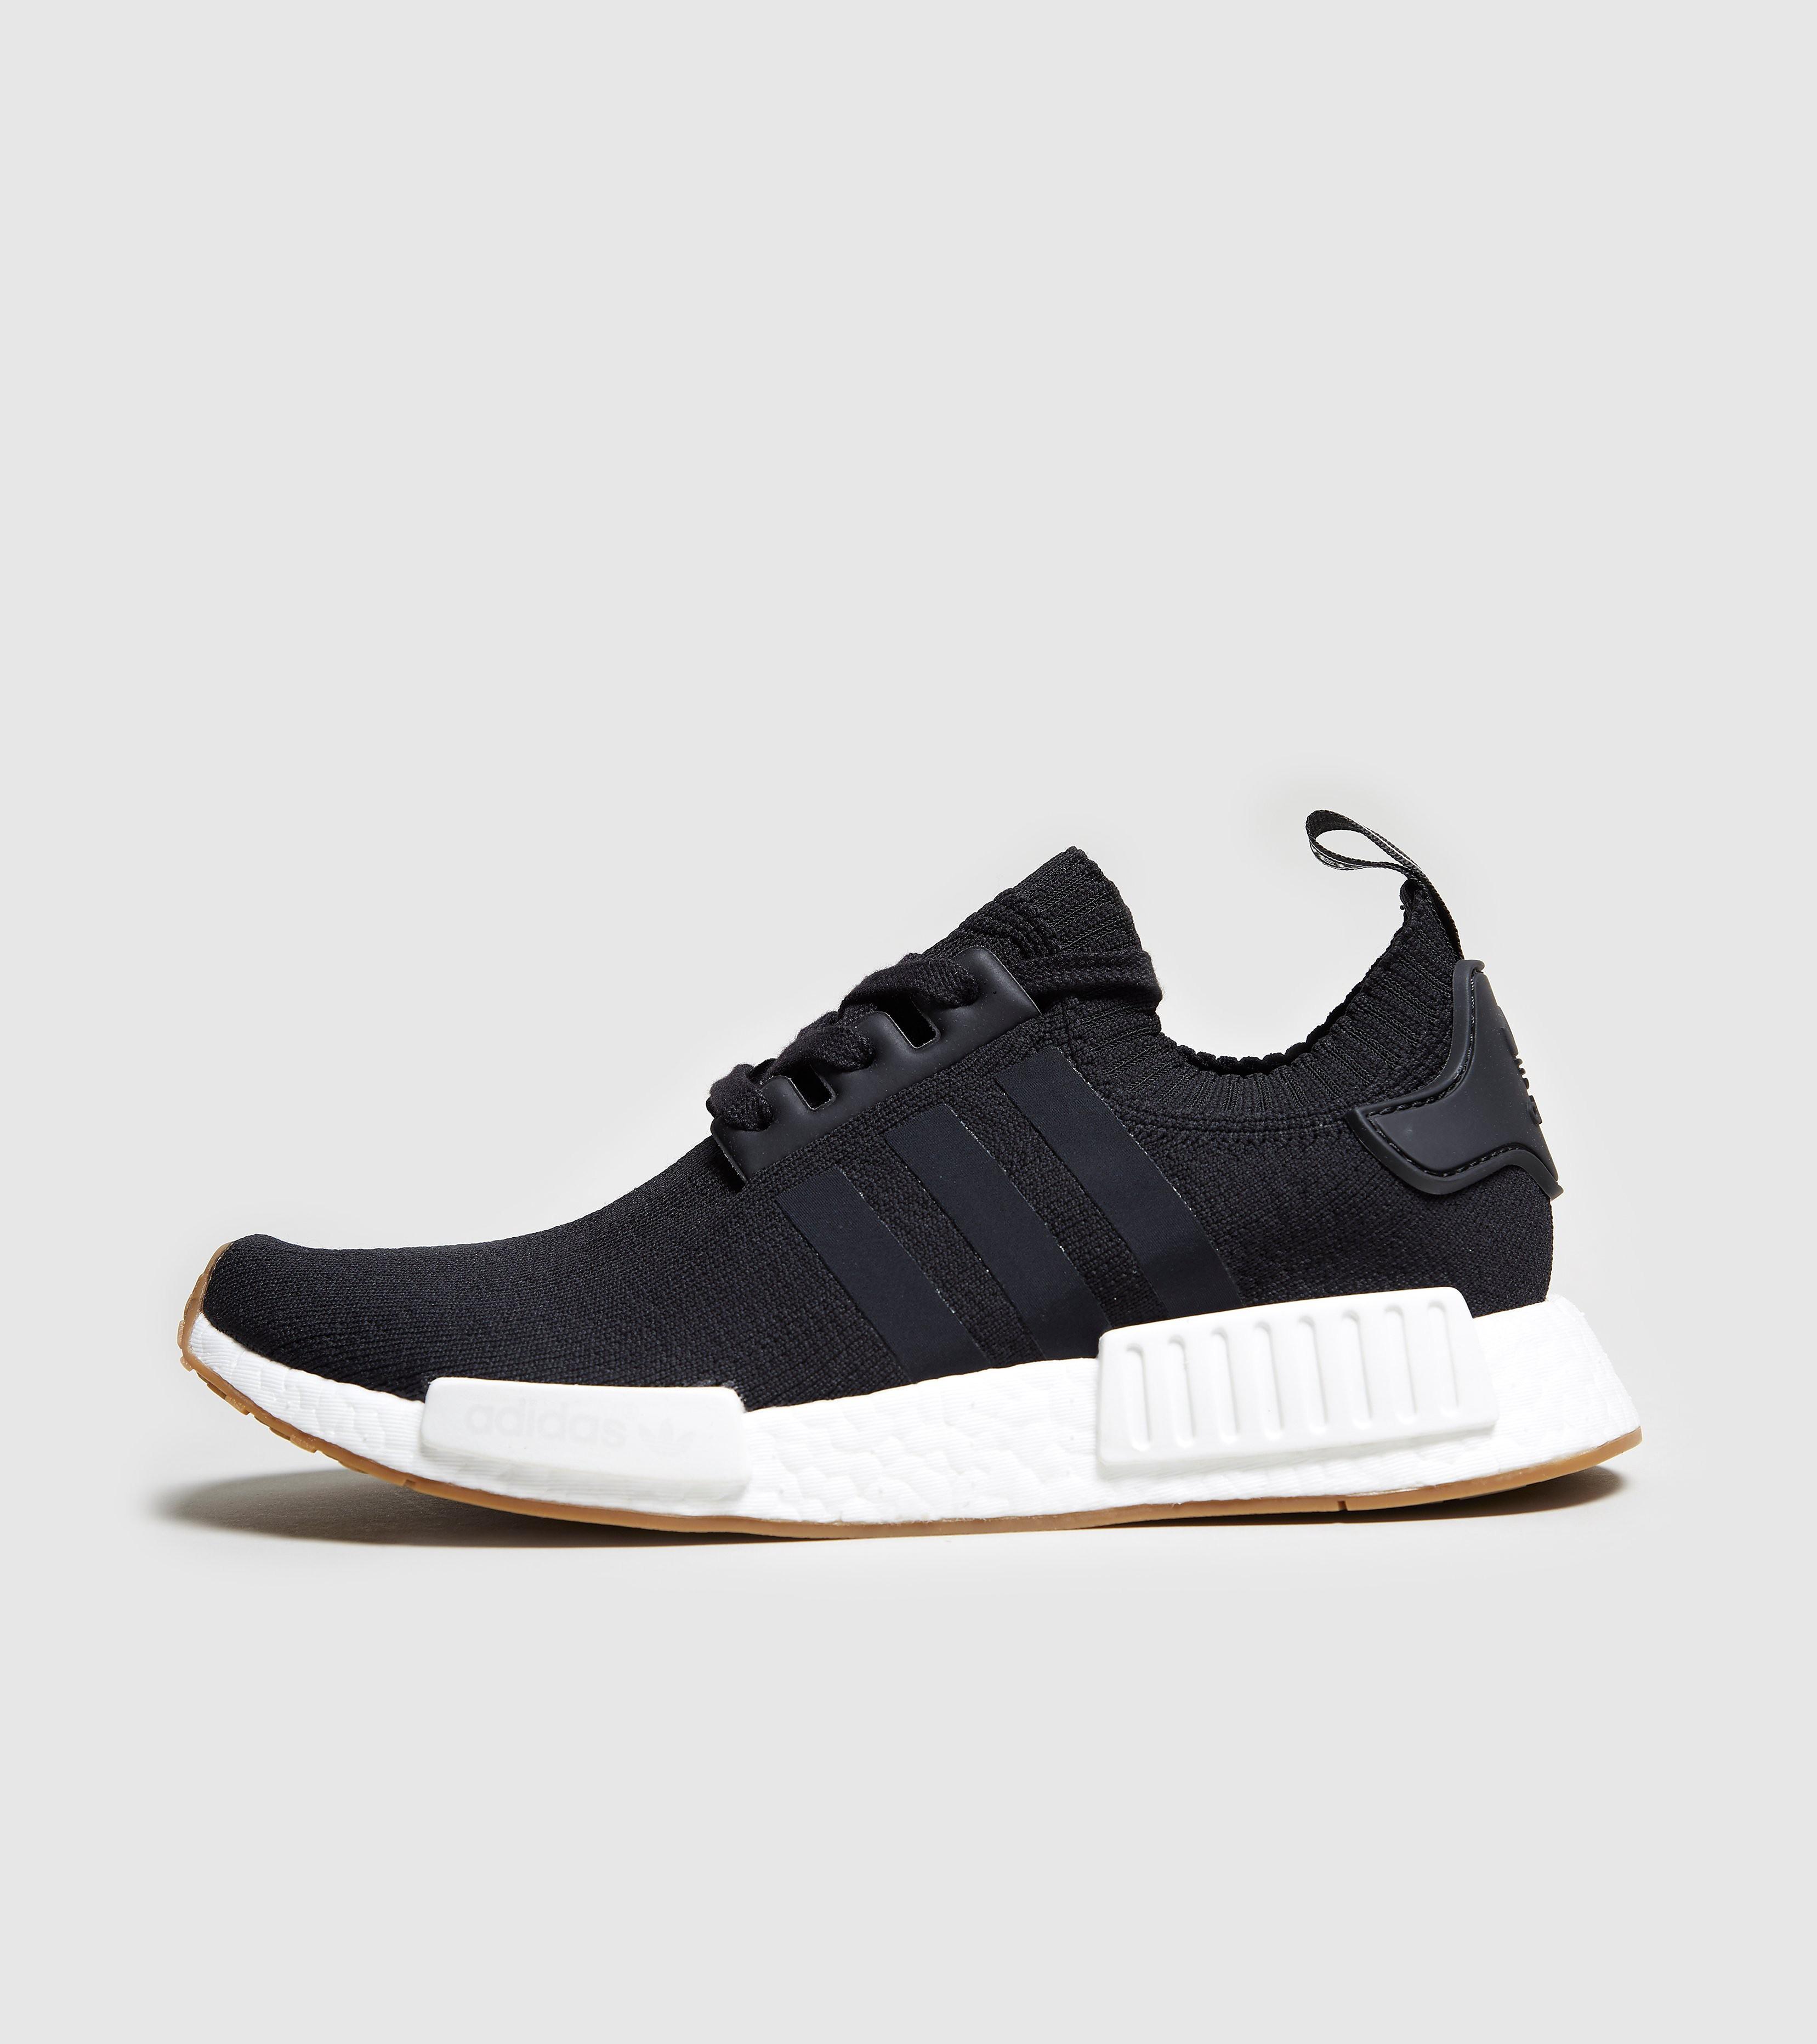 adidas Originals NMD_R1 Primeknit, Black/White